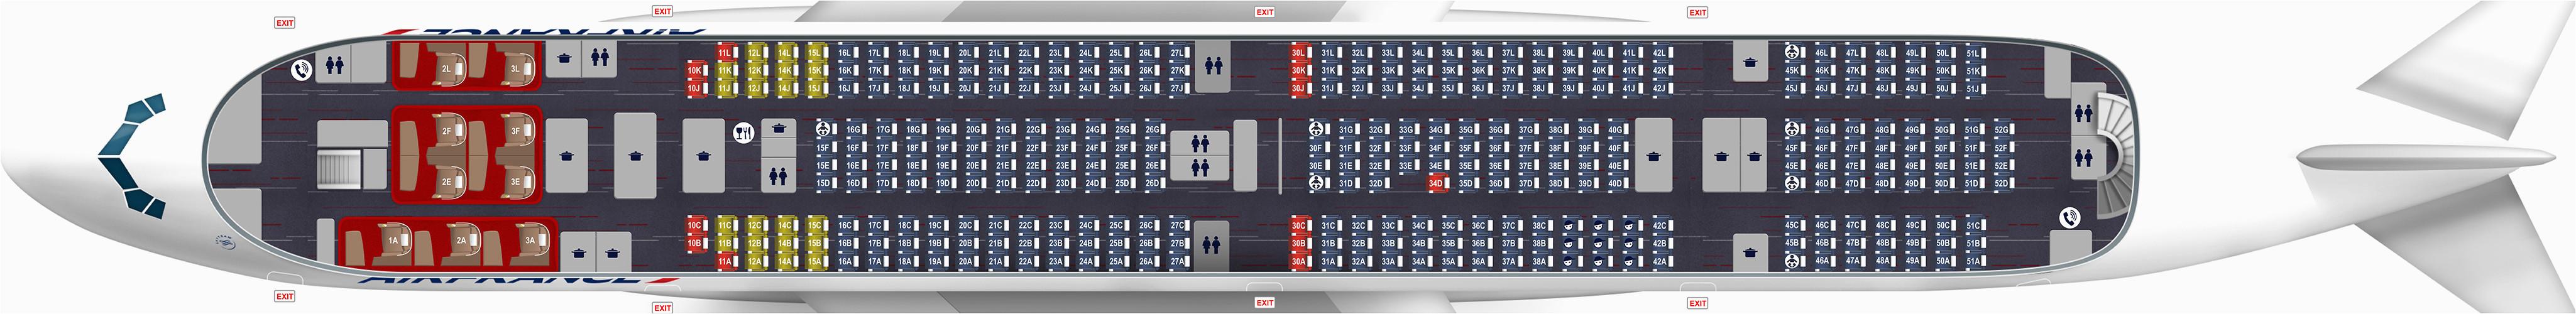 a380 map 516 seats